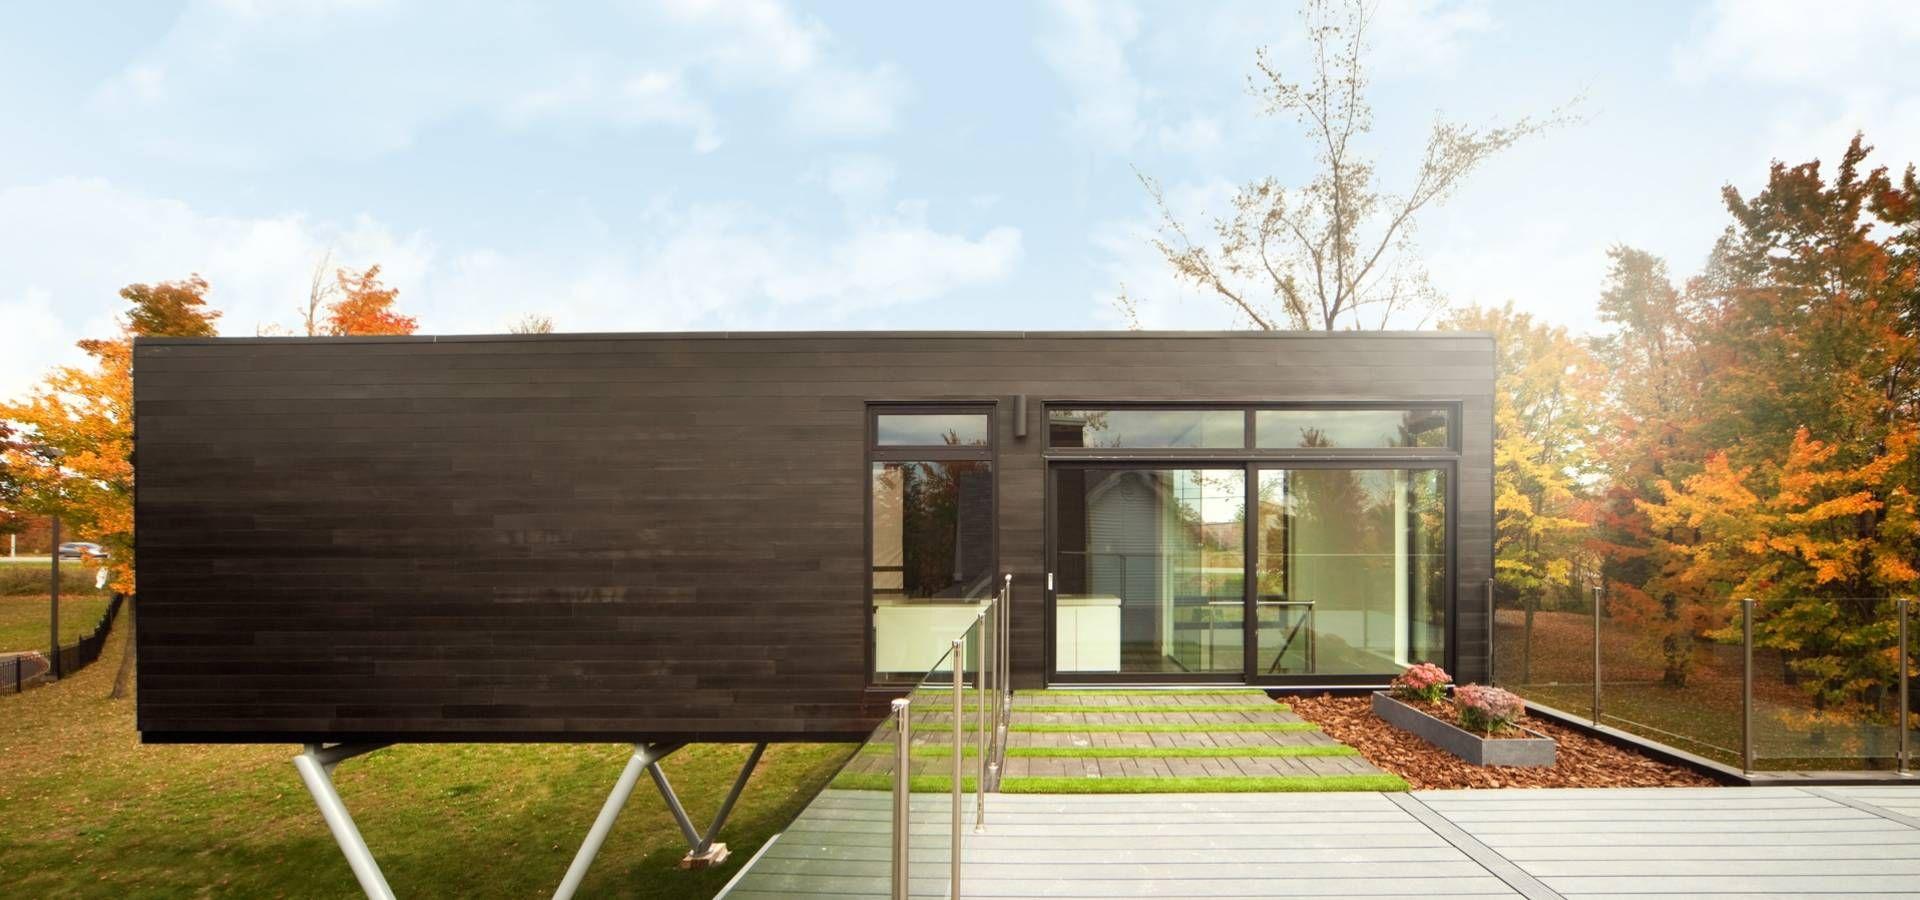 Home- designer build | studio | Pinterest | Modernism ...